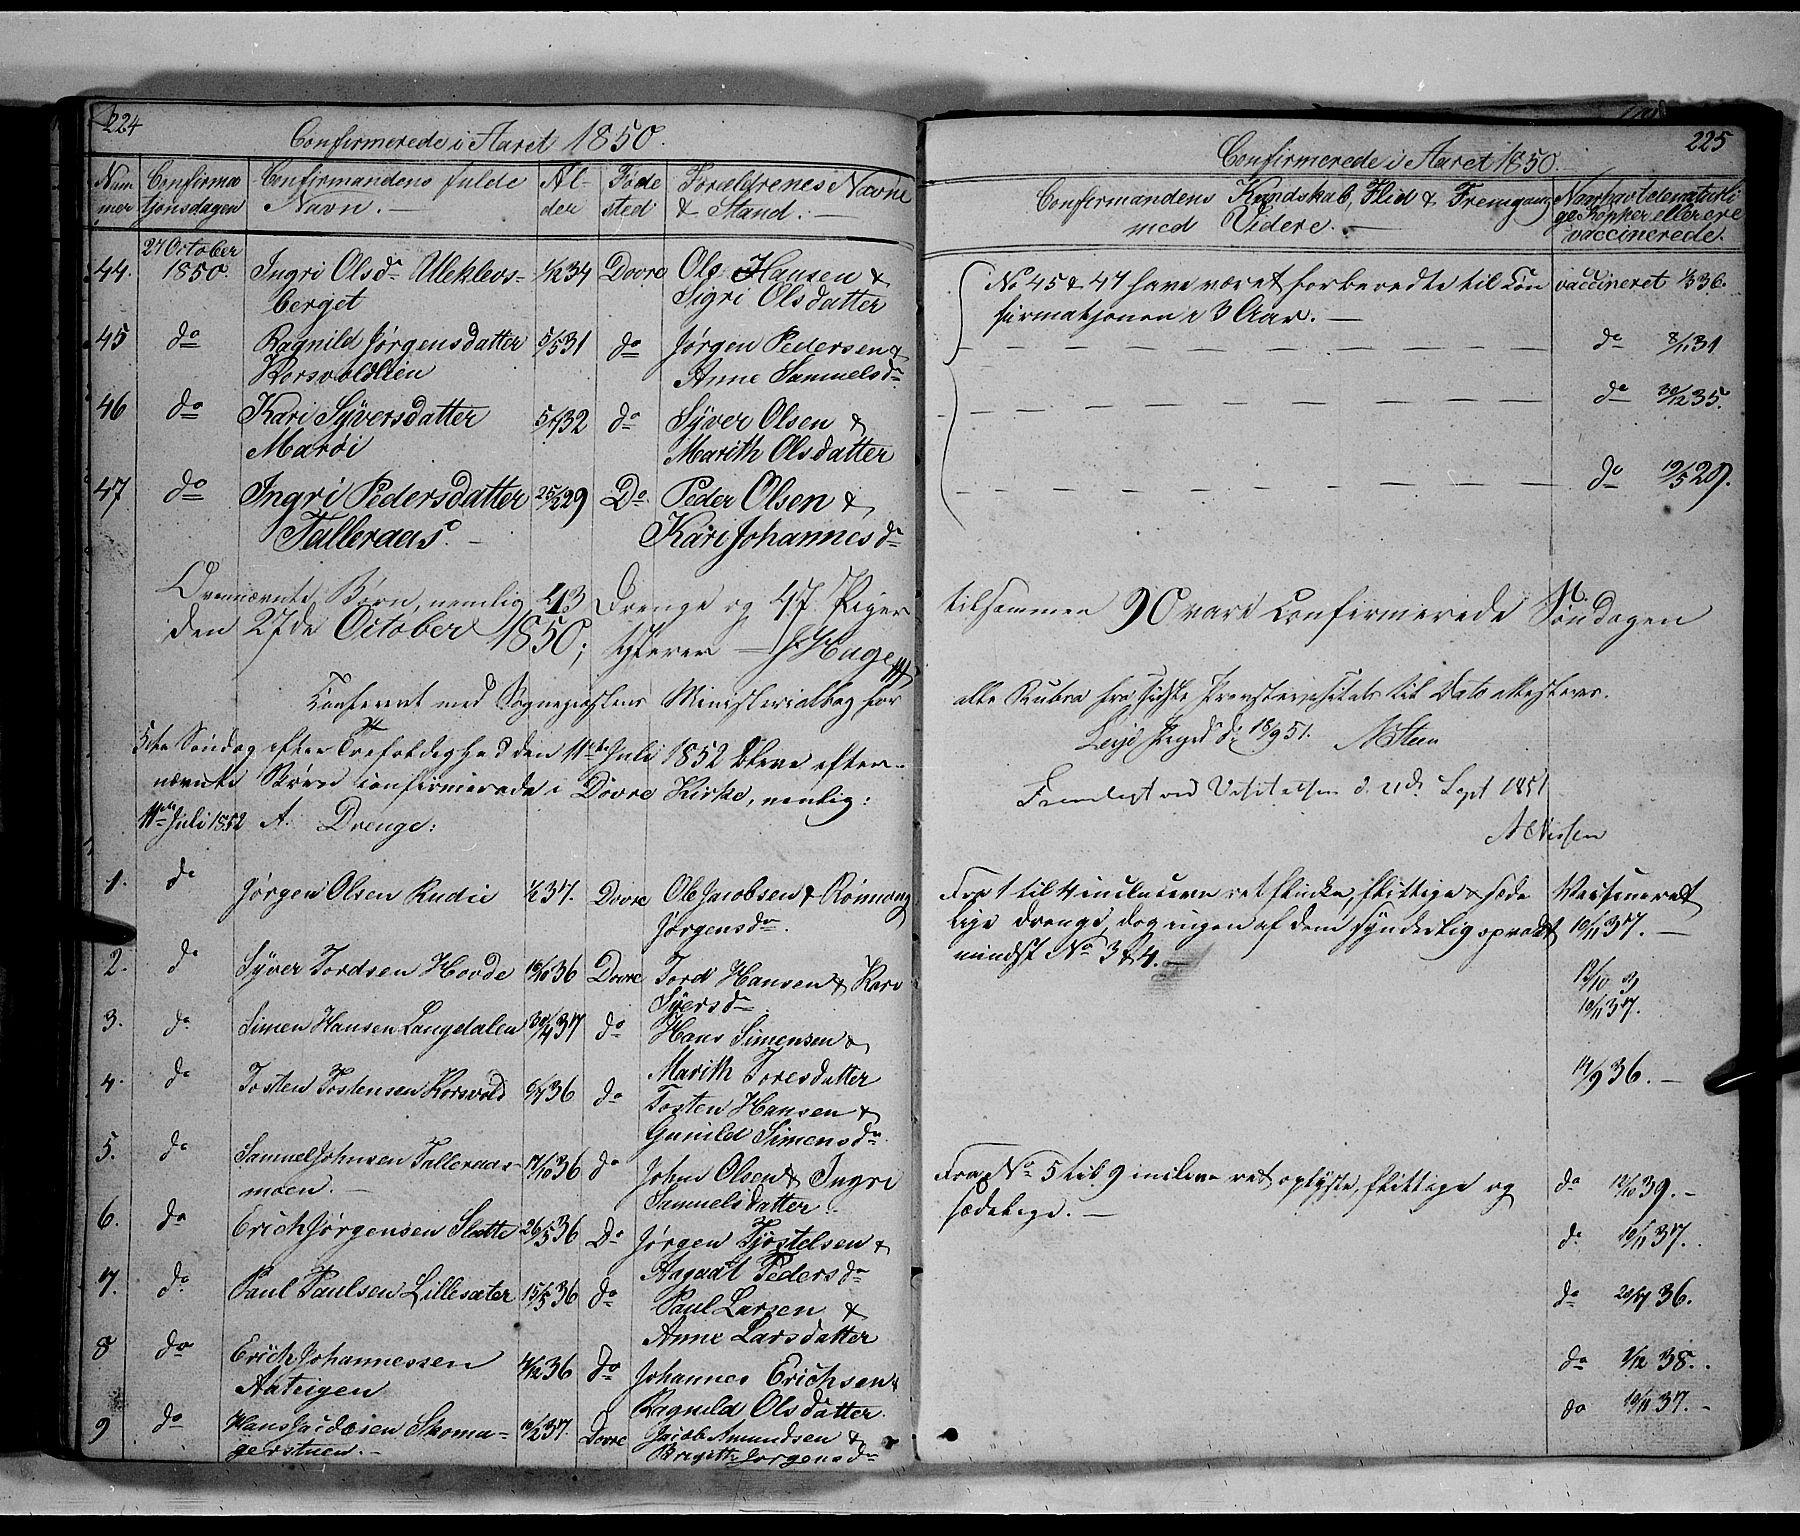 SAH, Lesja prestekontor, Klokkerbok nr. 3, 1842-1862, s. 224-225